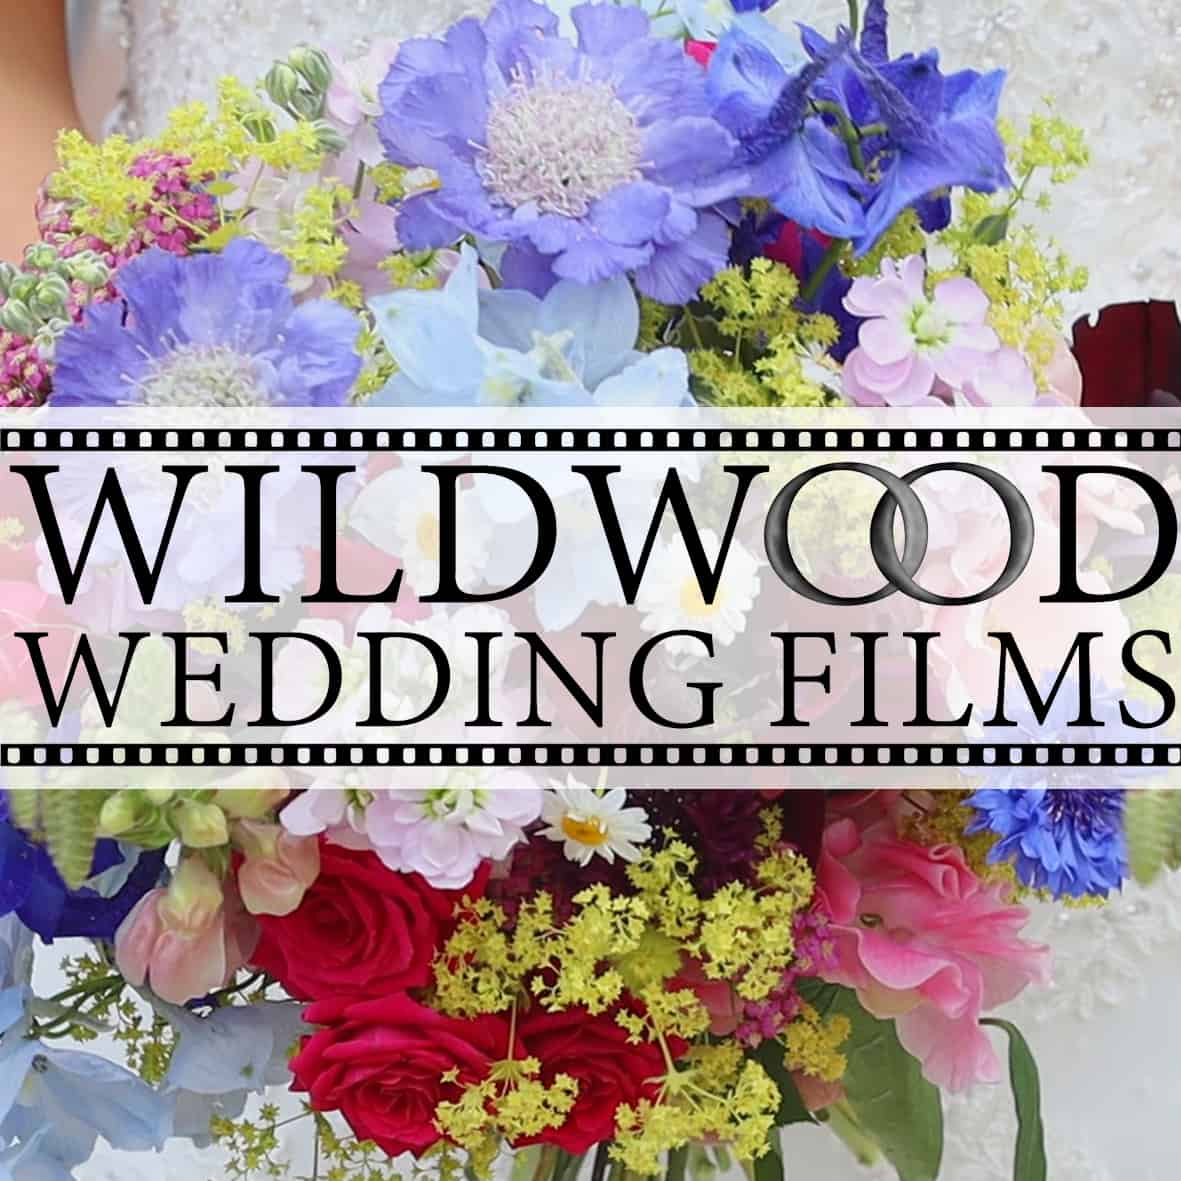 wild-wood-scottish-glasgow-wedding-videographers-logo